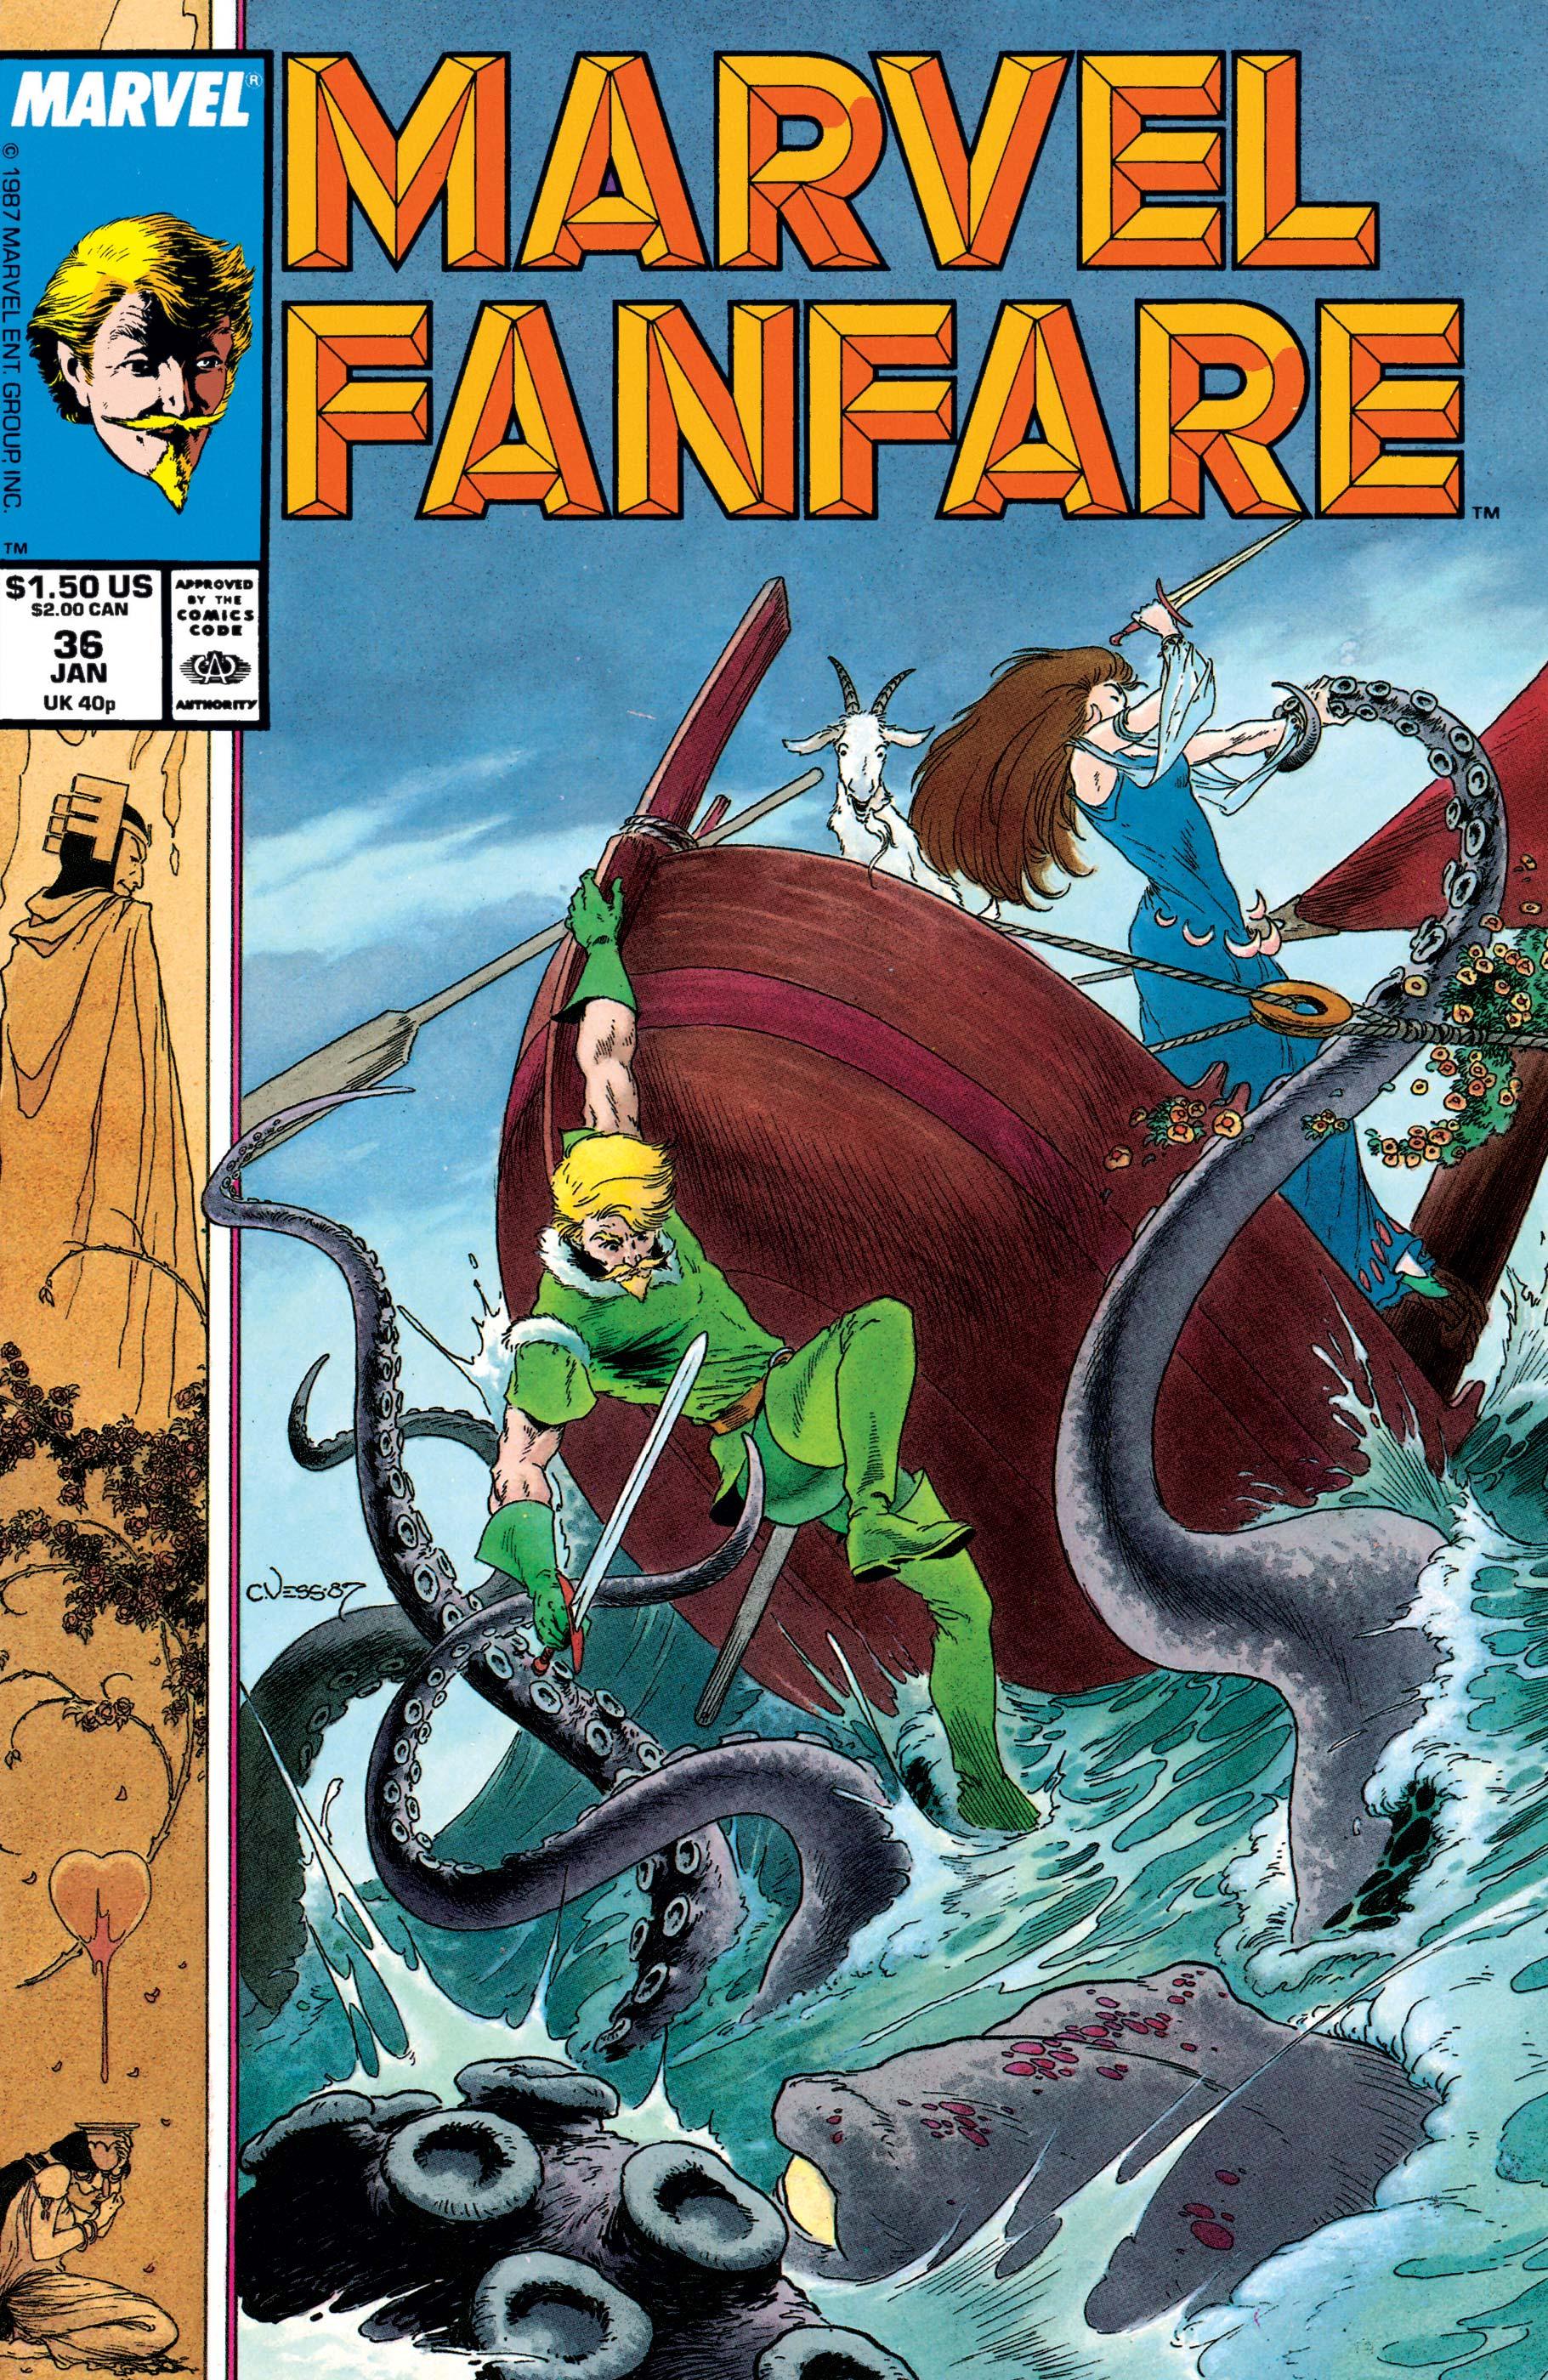 Marvel Fanfare (1982) #36